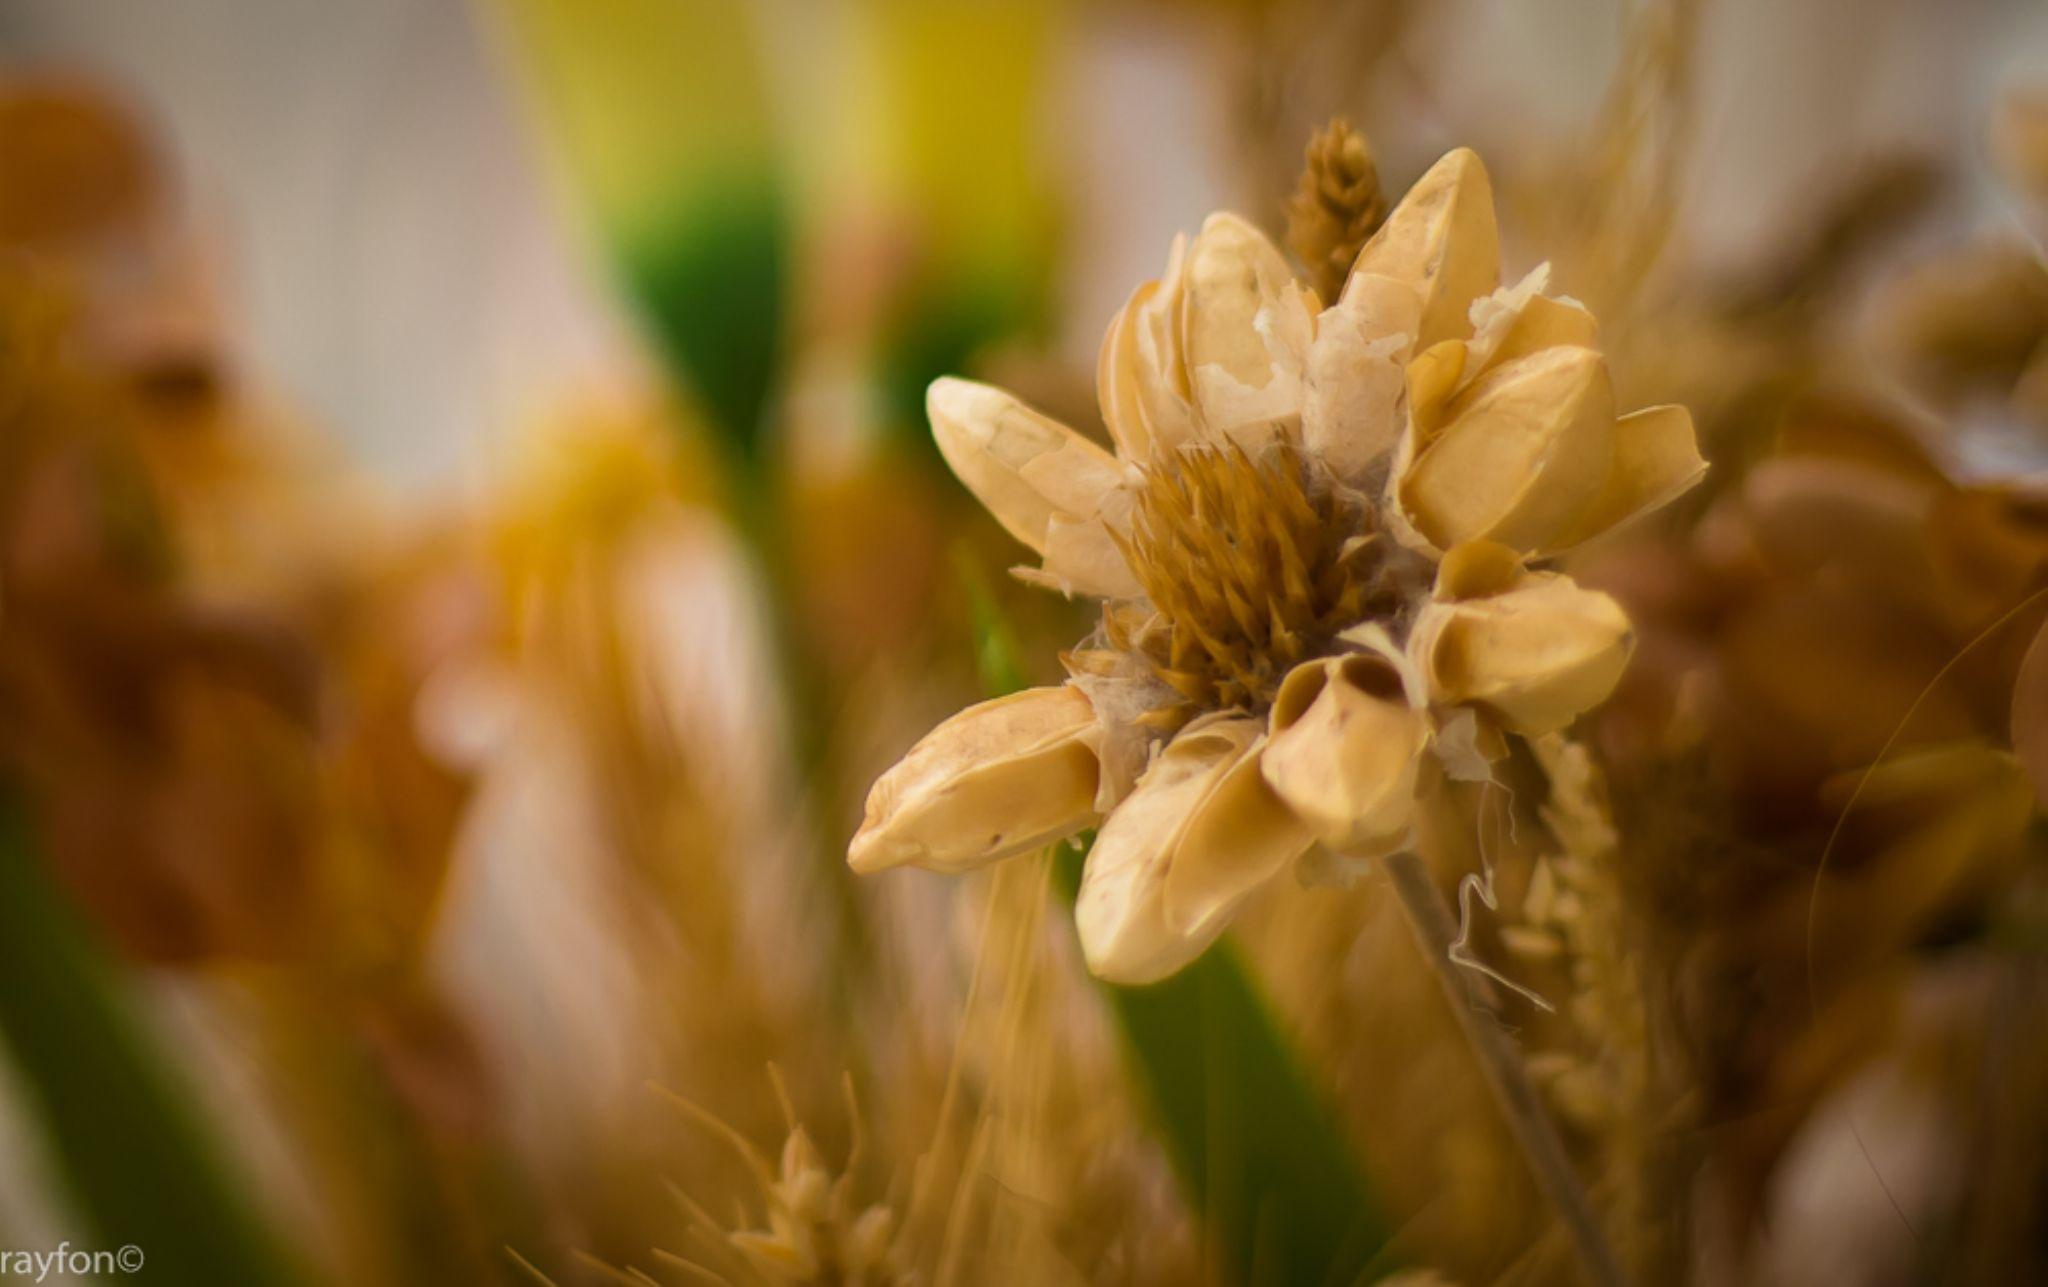 Dry Flower Bokeh by Rainiero Barra